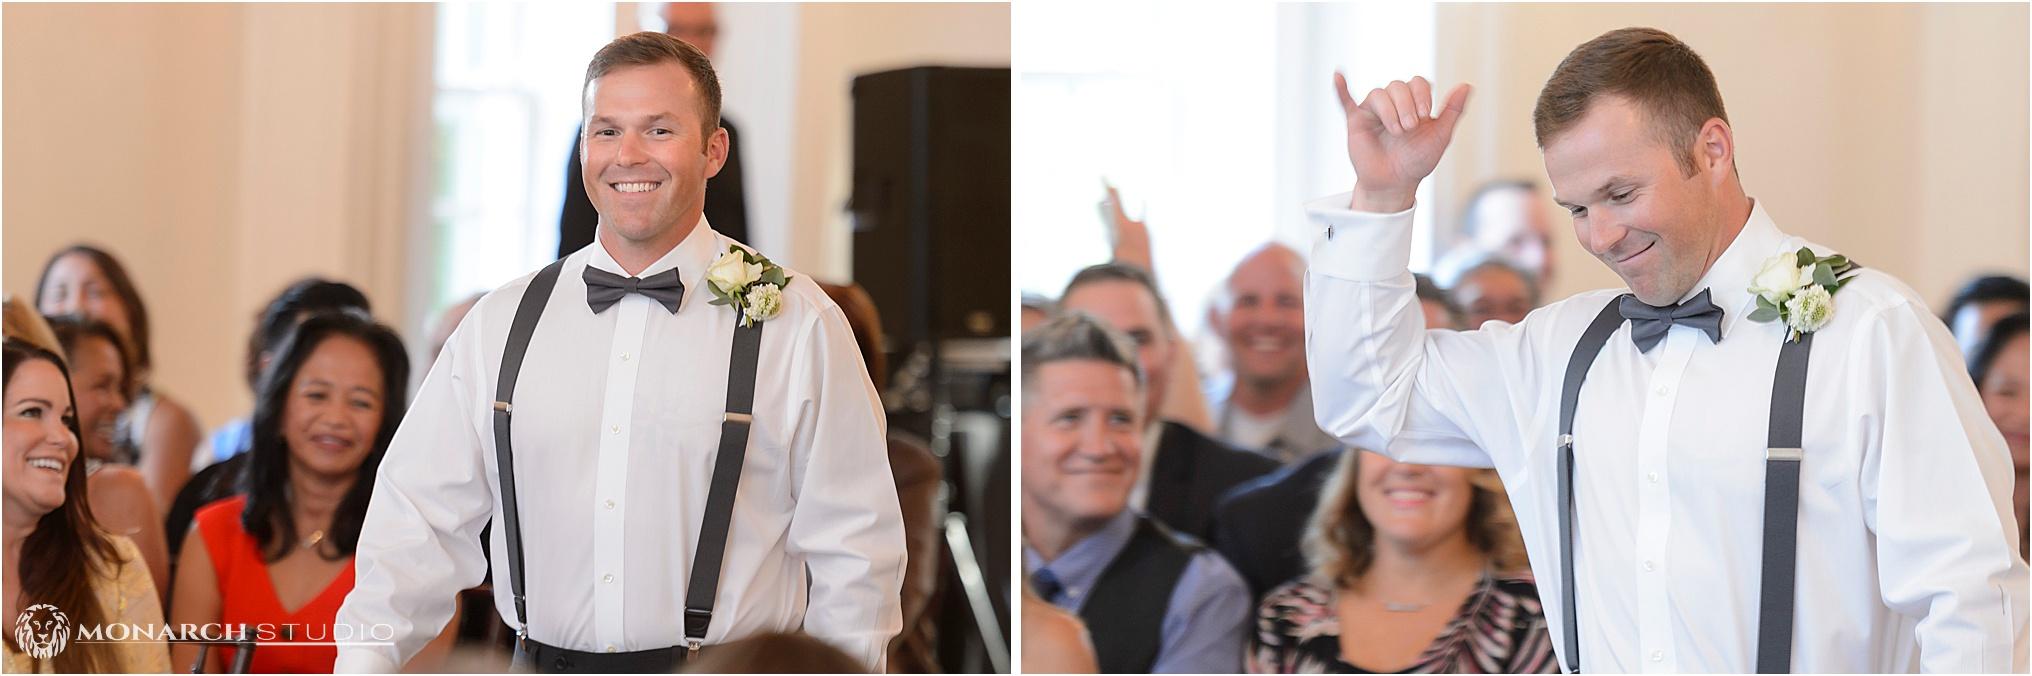 063-whiteroom-wedding-photographer-2019-05-22_0045.jpg